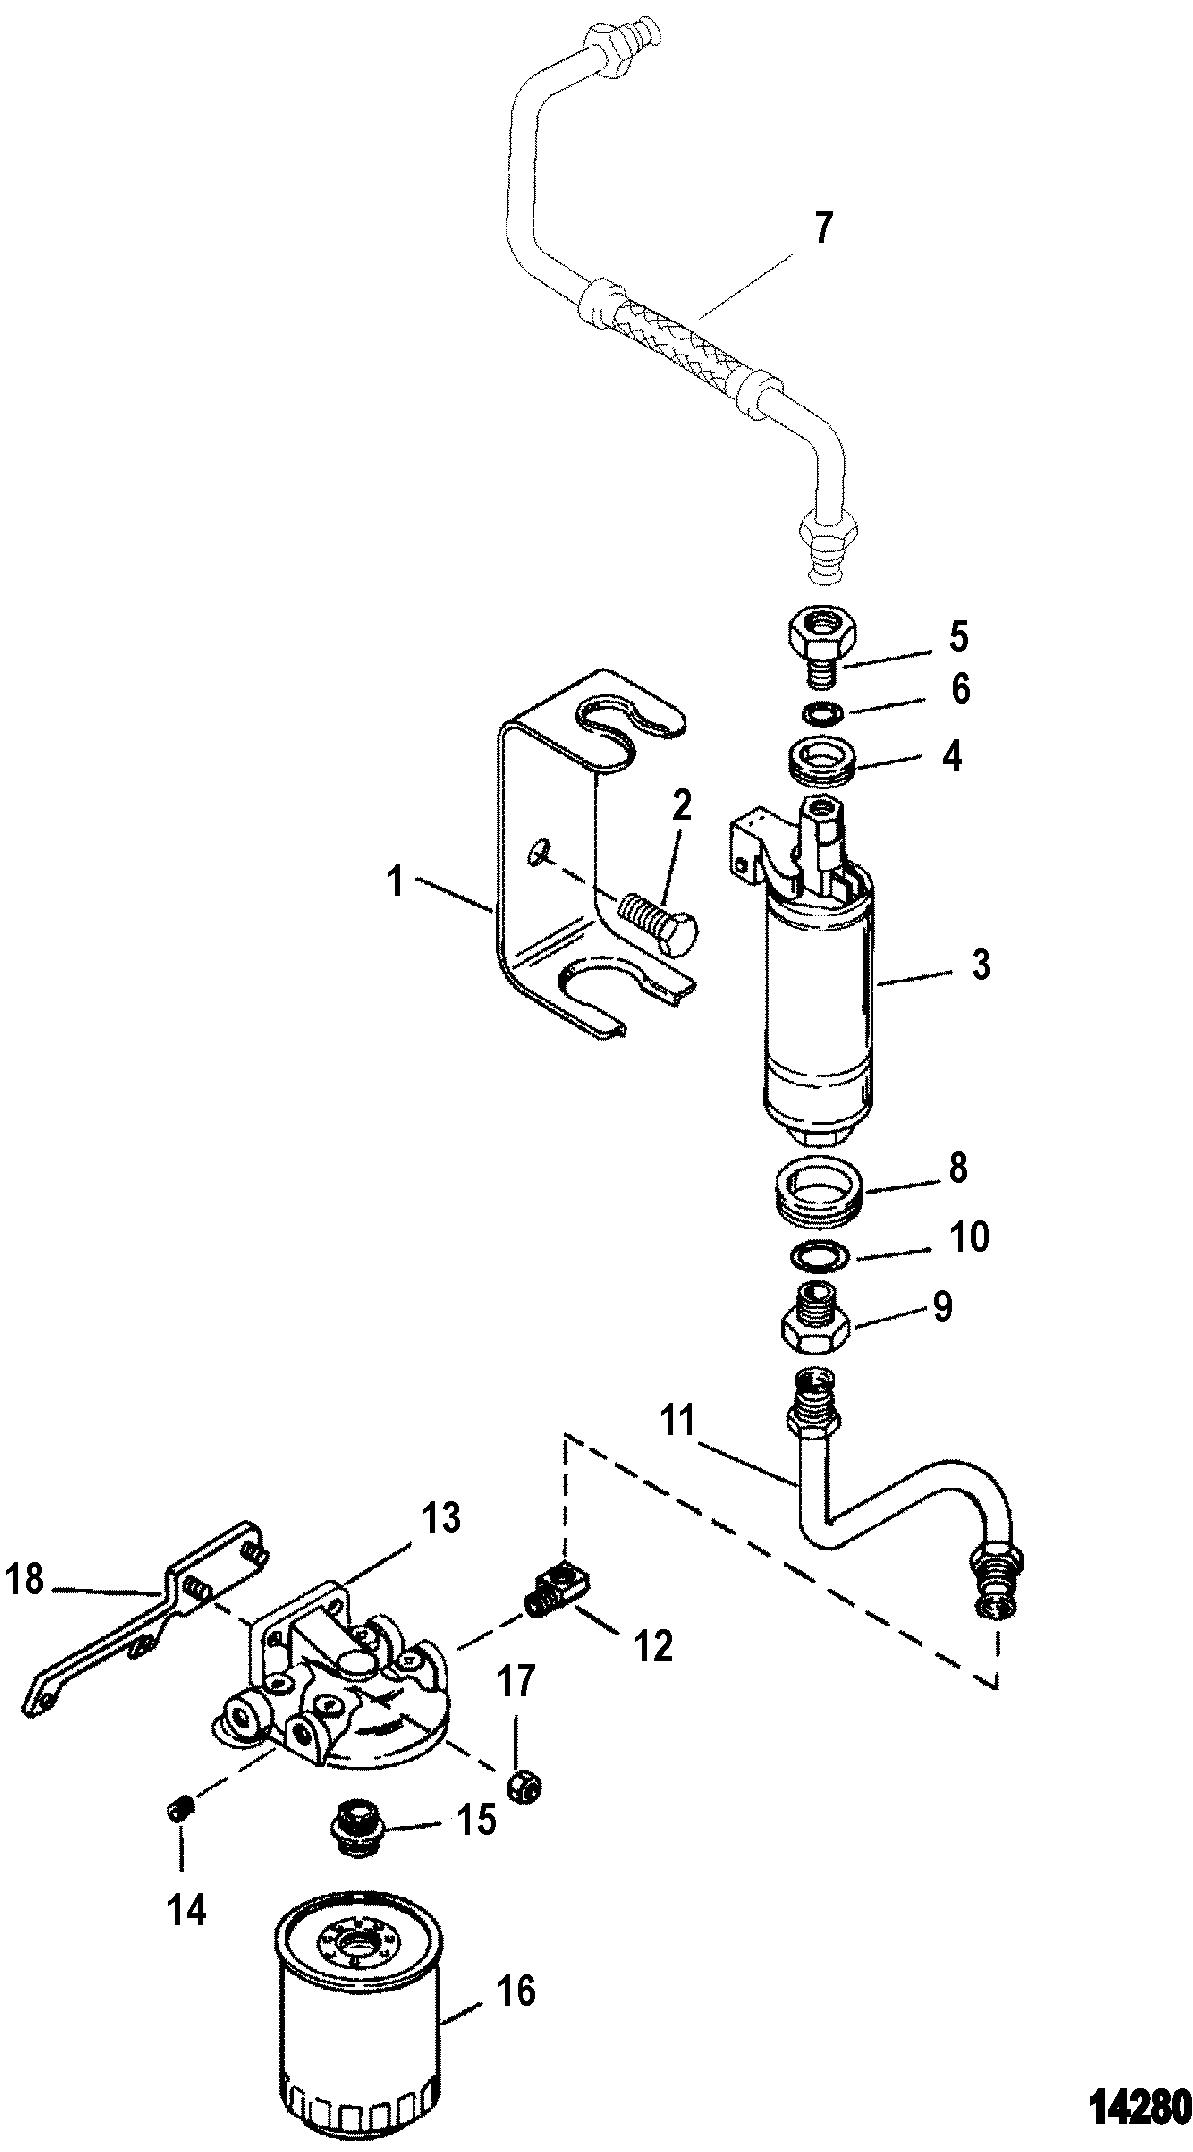 Mercruiser 262 Mag Tbigen 0f803800 Mercury Fuel Filter Housing Pump And Filtervst System